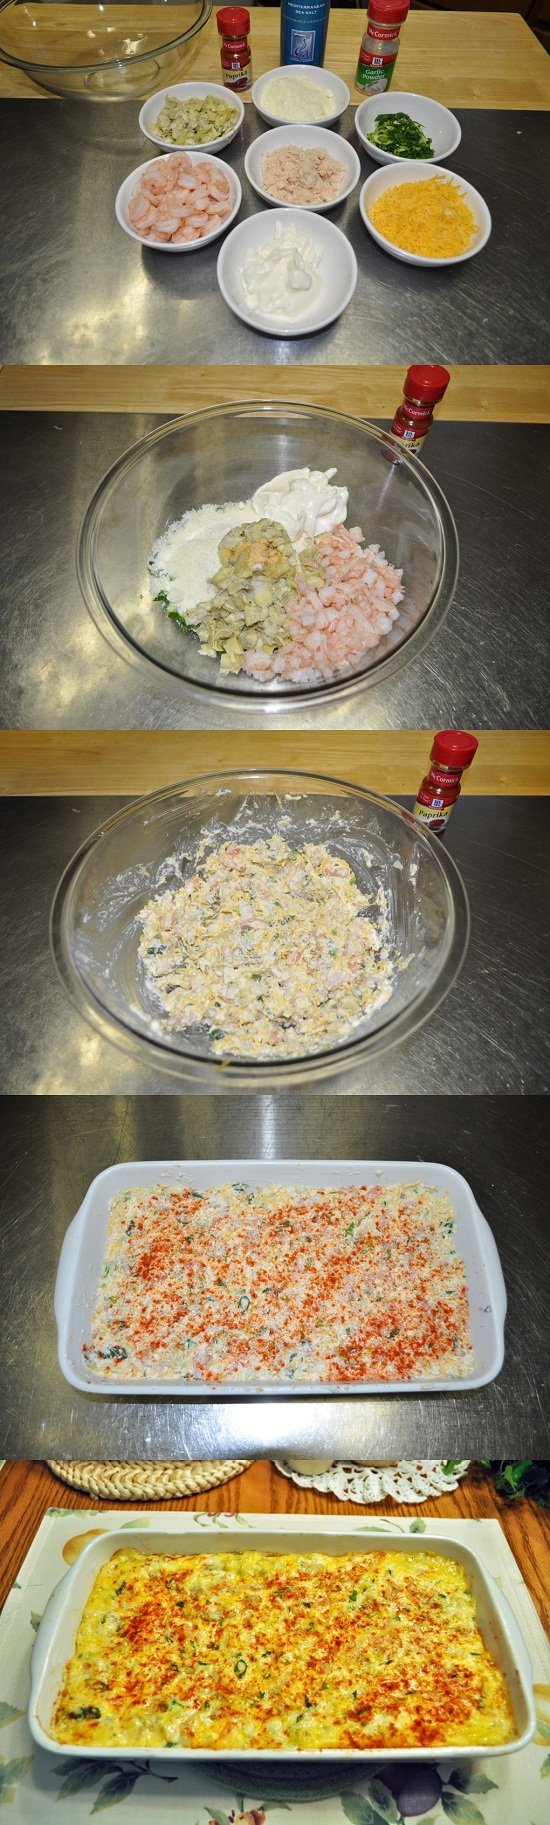 Cheesy-Crab-Shrimp-and-Artichoke-Dip-Recipe